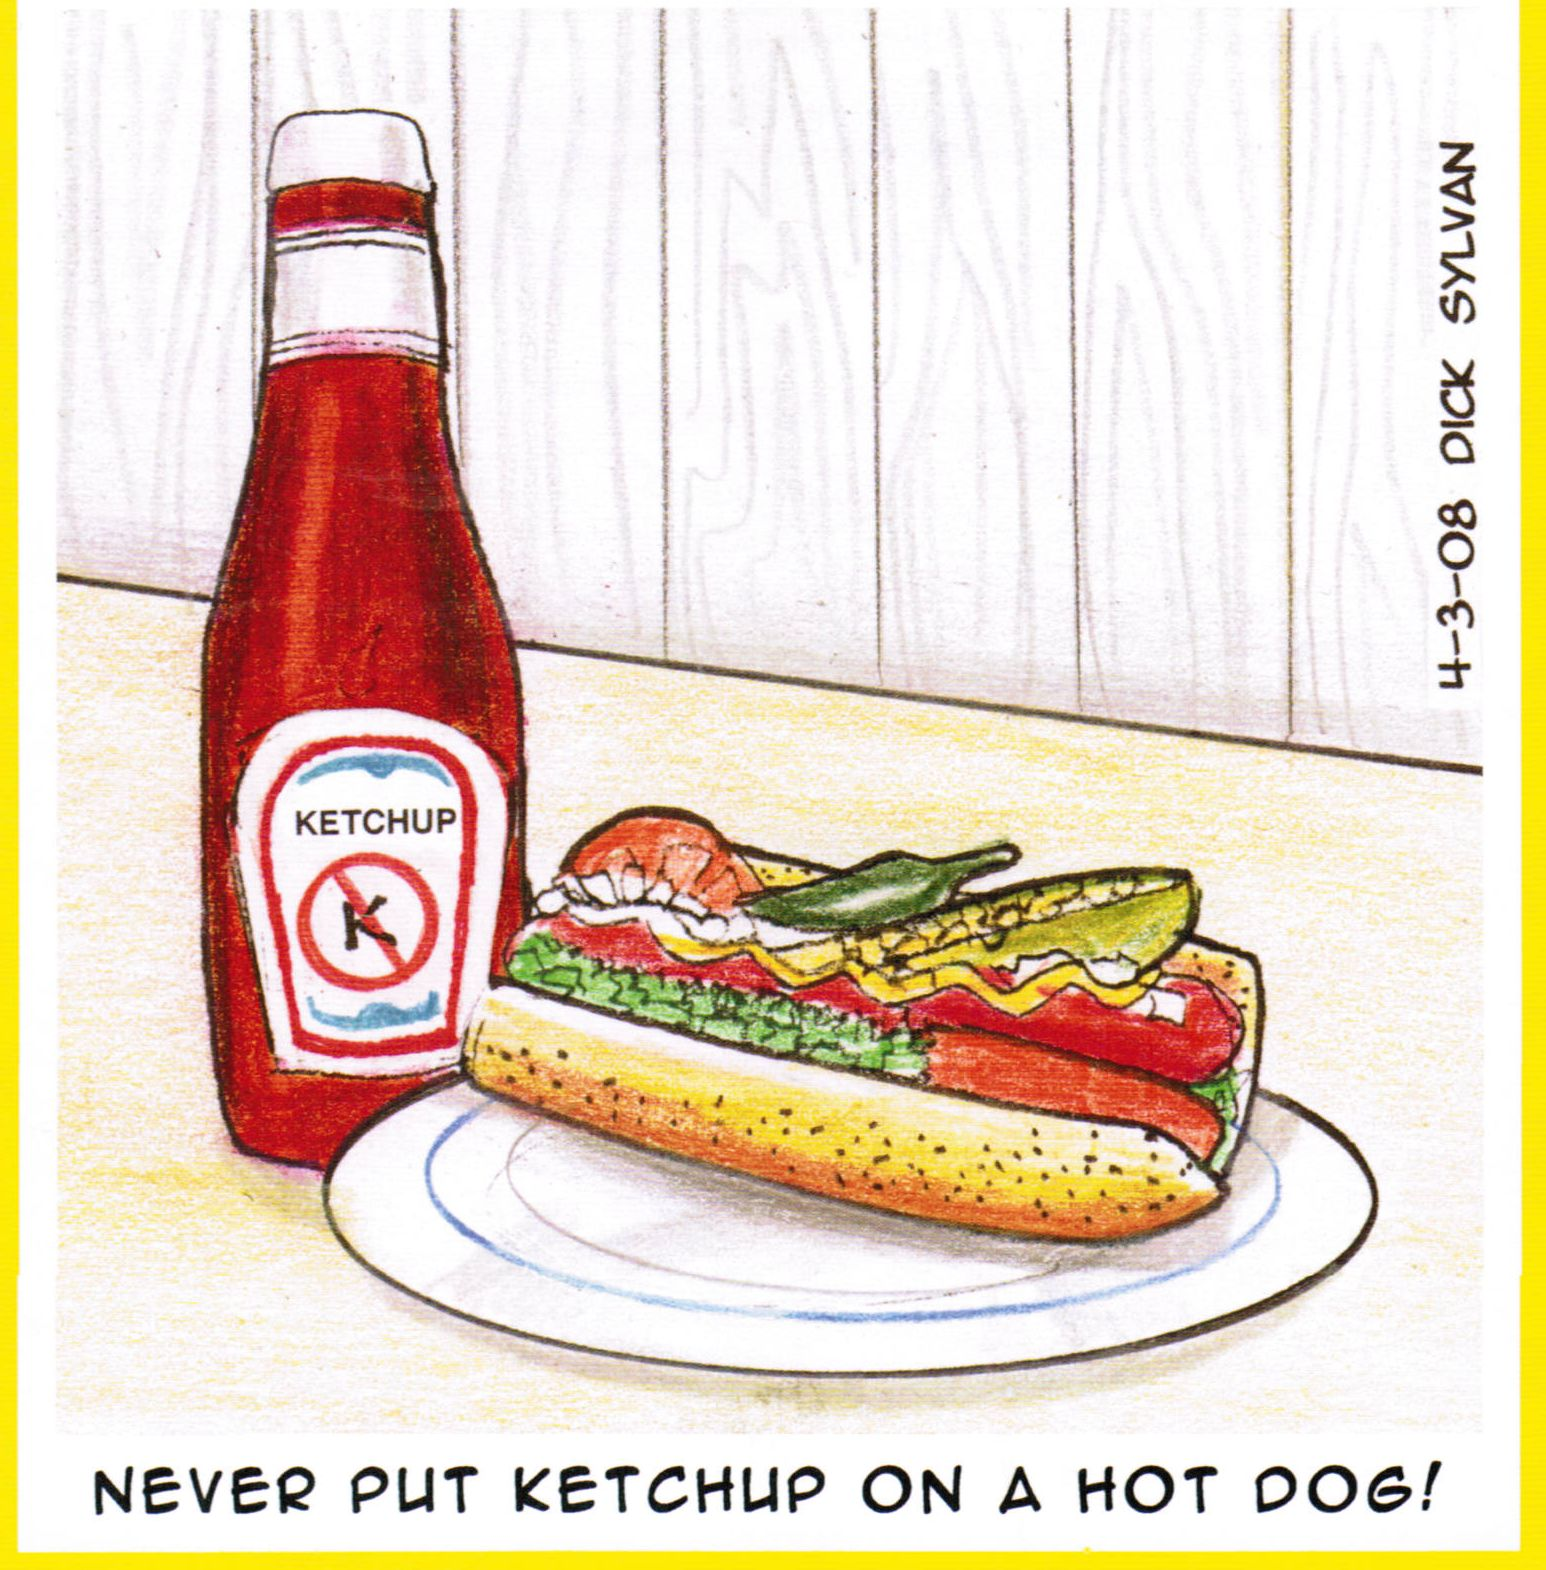 Chicago Hot Dog Ketchup Law